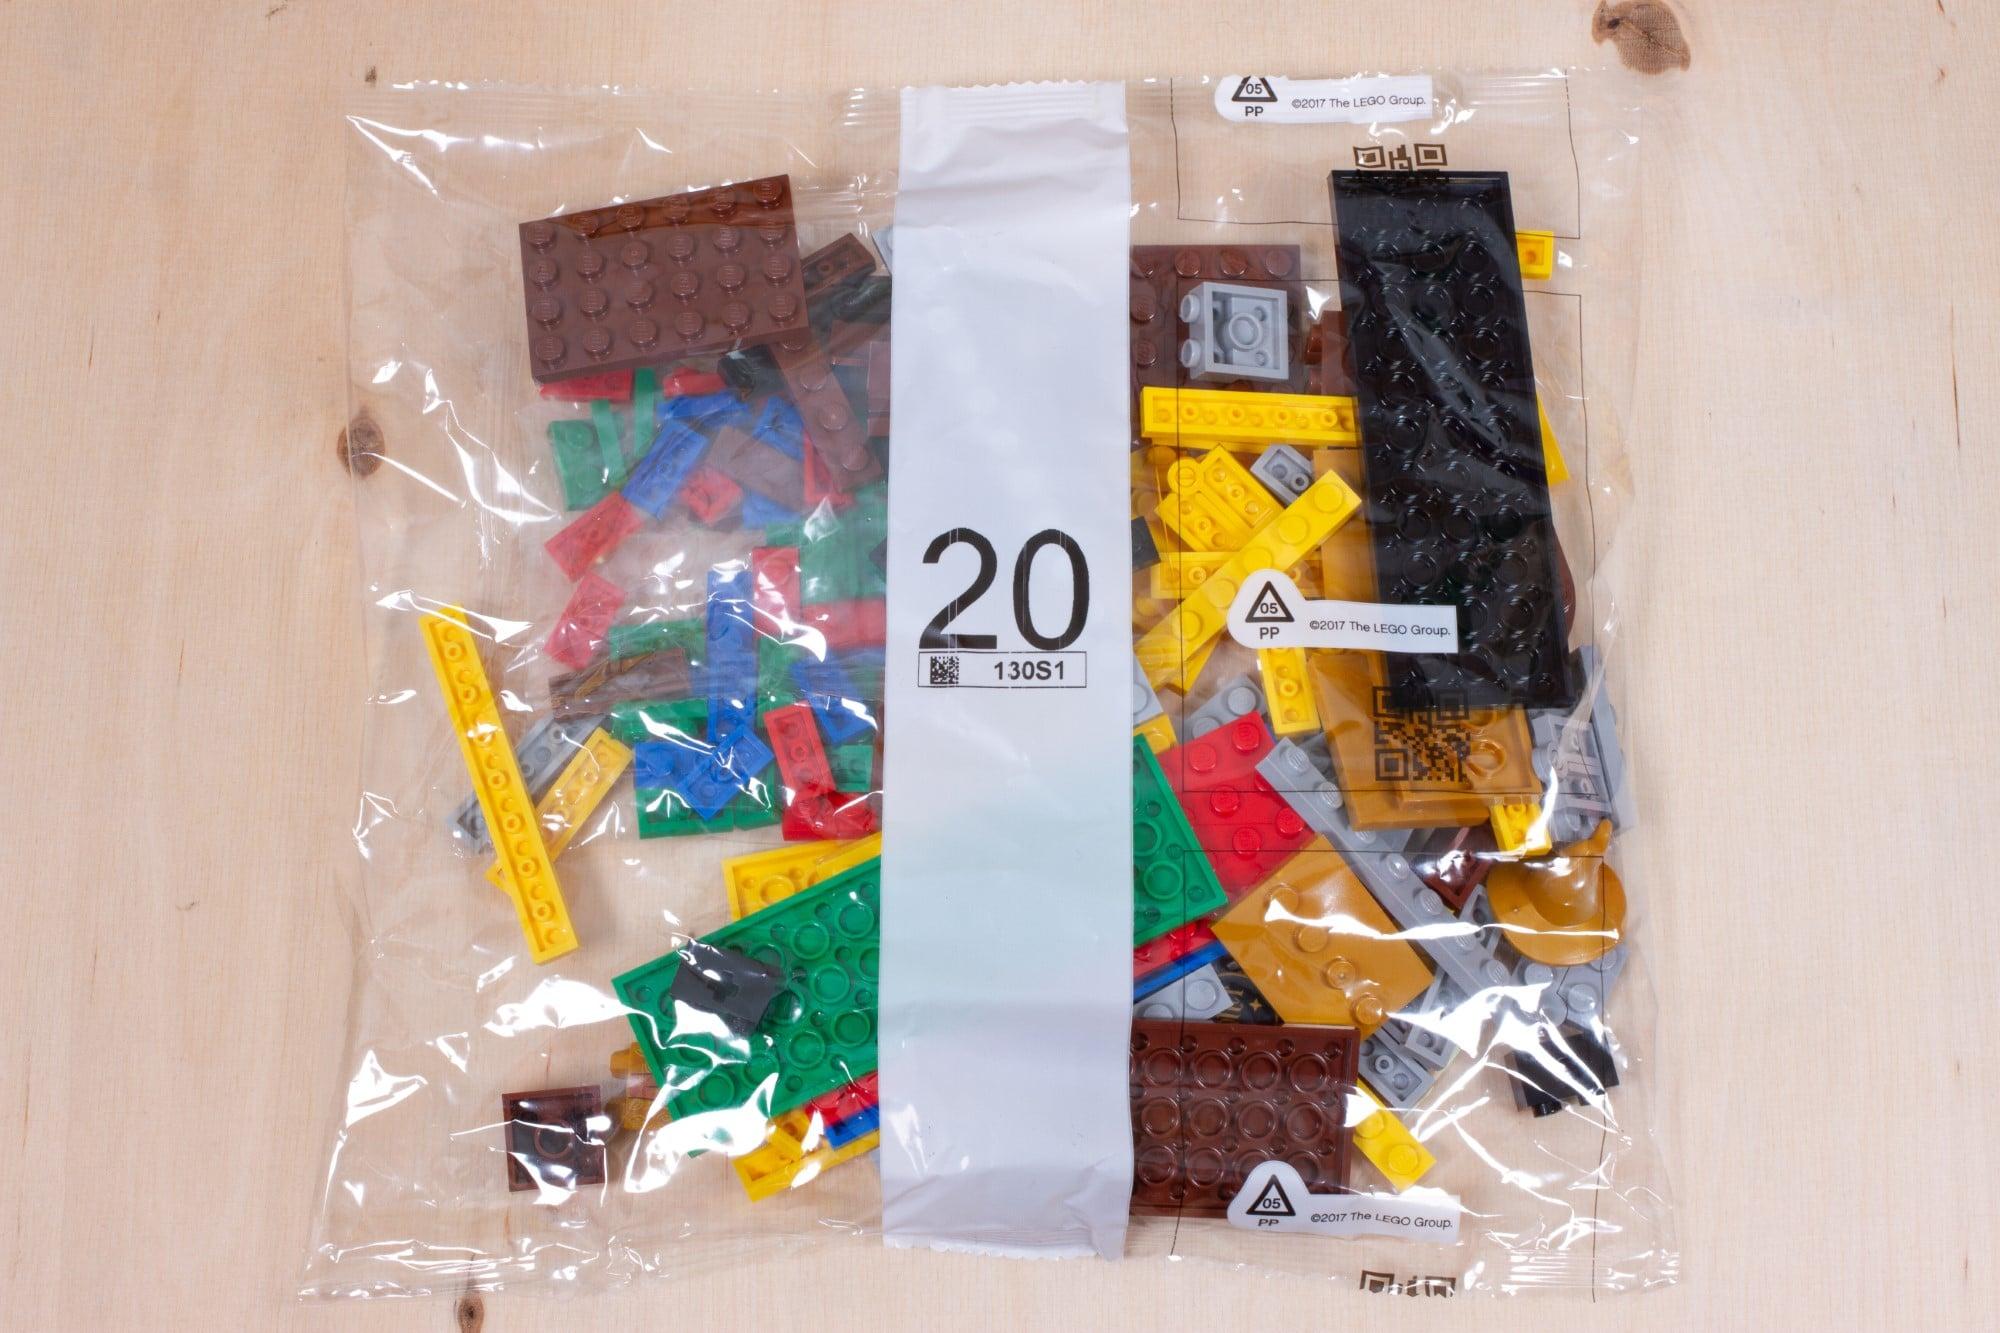 LEGO 76391 Hogwarts Icons Review Unboxing 1 Schritt 20